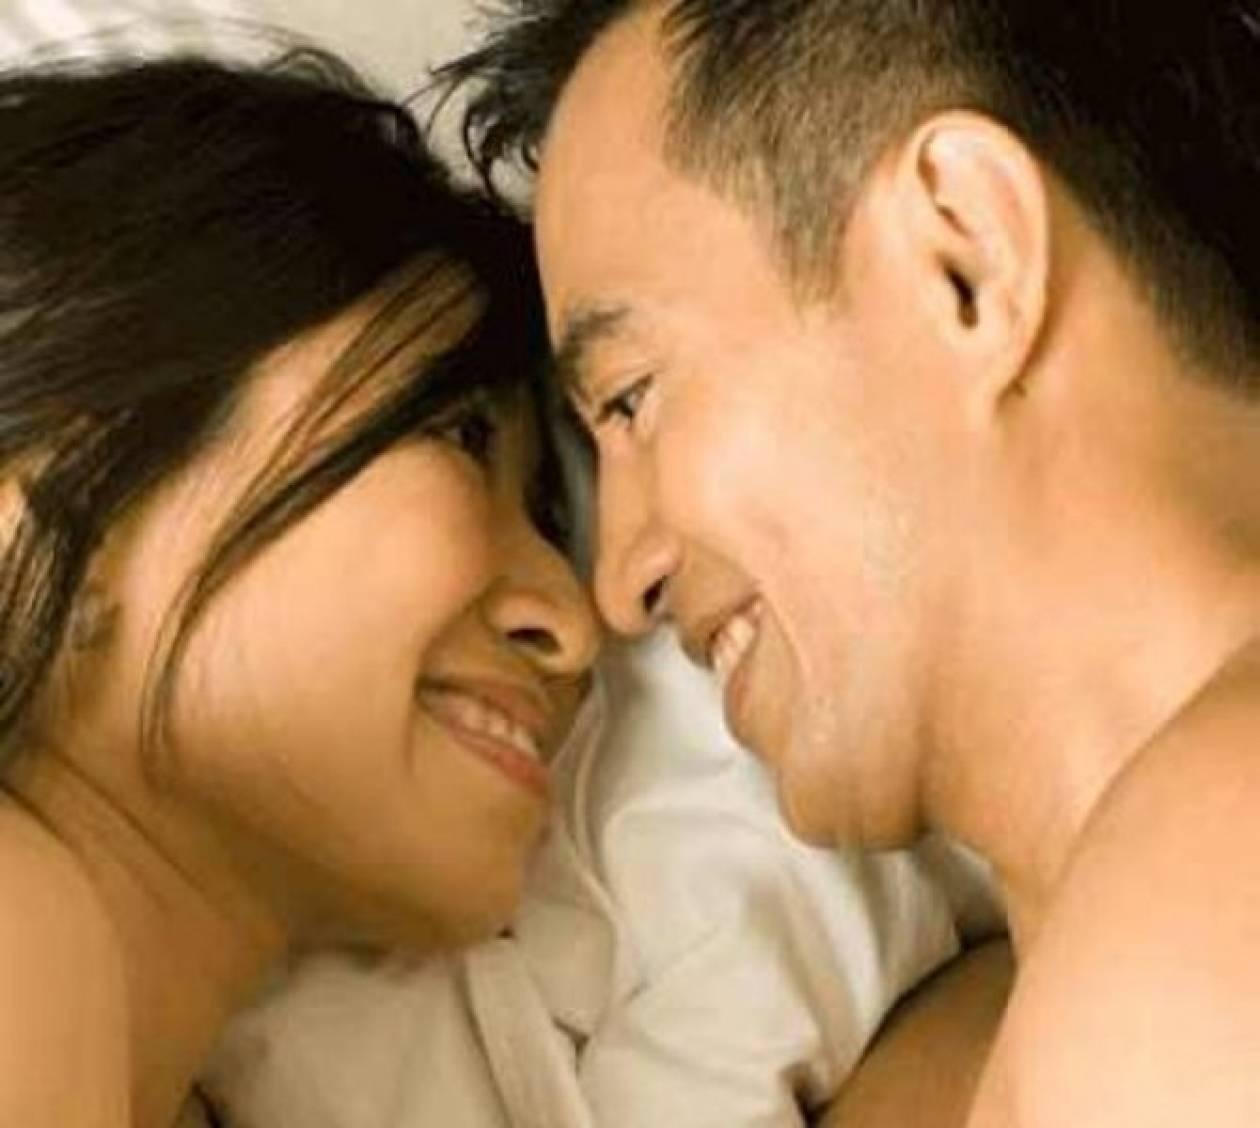 Old Dating: η νέα μόδα στις σχέσεις